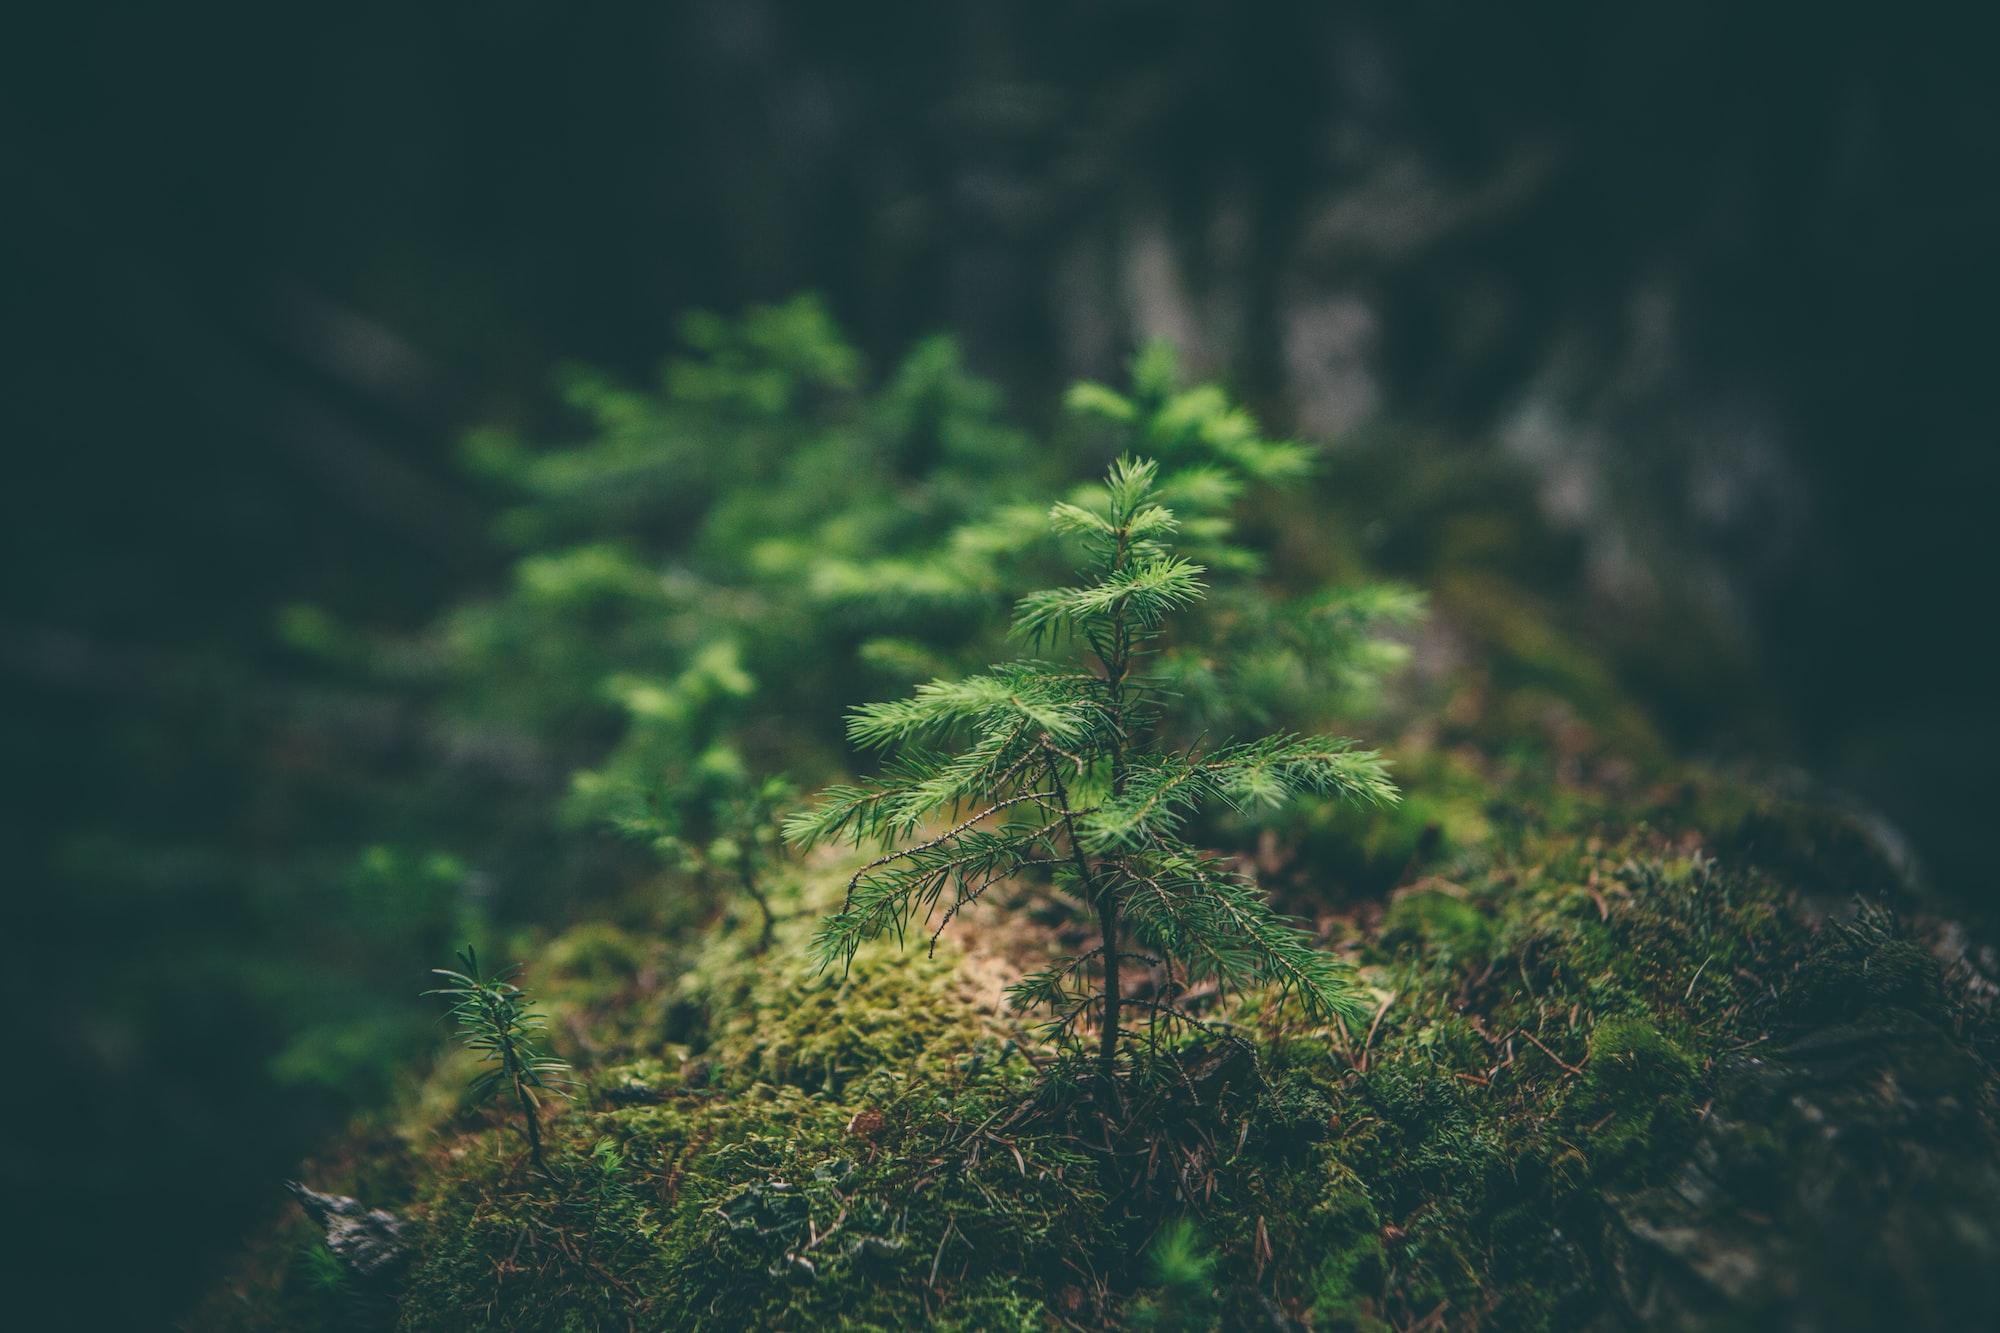 Conifer sapling